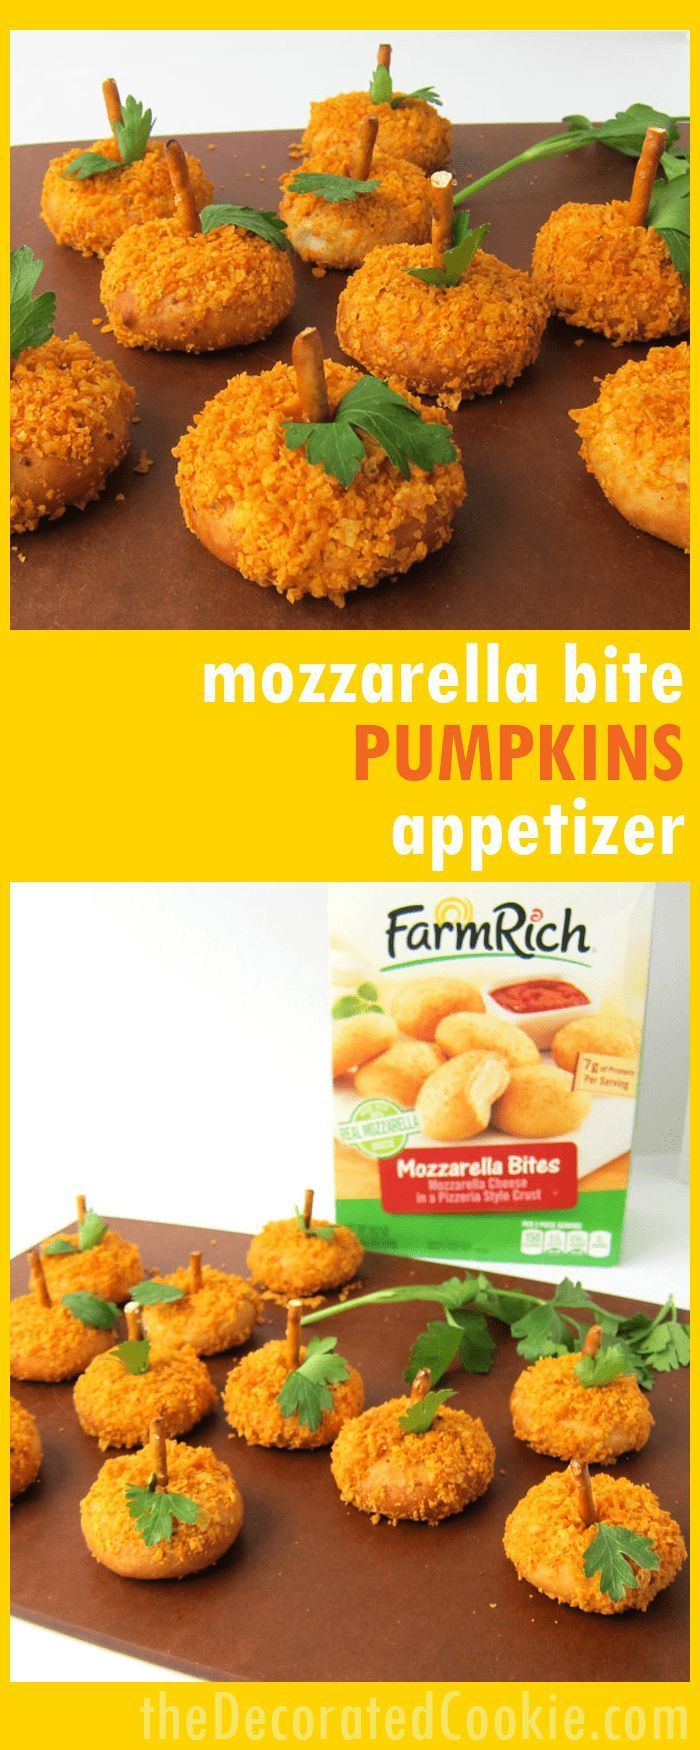 Appetizer with mozzarella bites Appetizer with mozzarella bites,